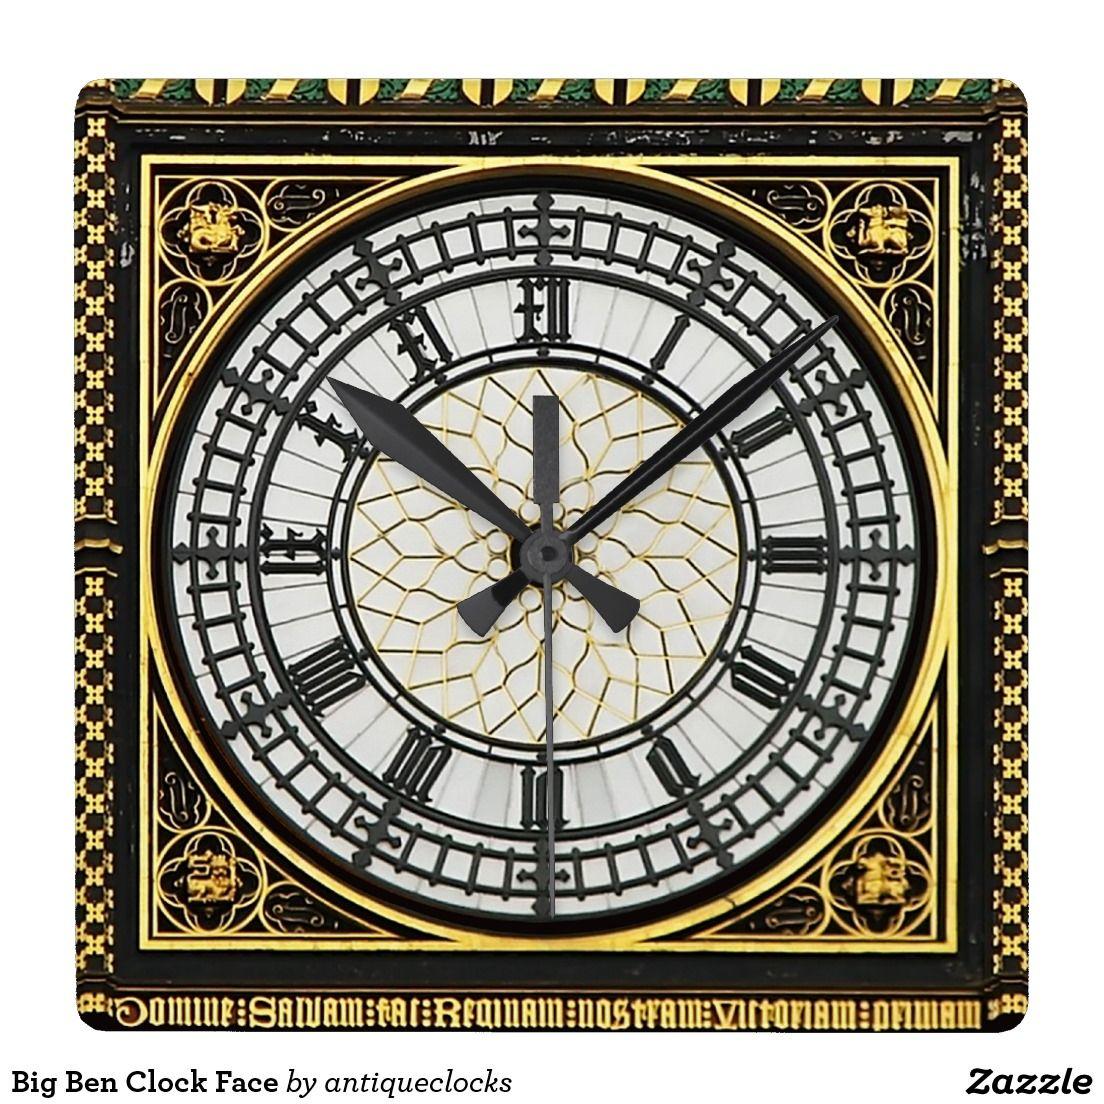 Big ben ziffernblatt quadratische wanduhr uhren clocks uhren wanduhren und ziffern - Coole wanduhren ...